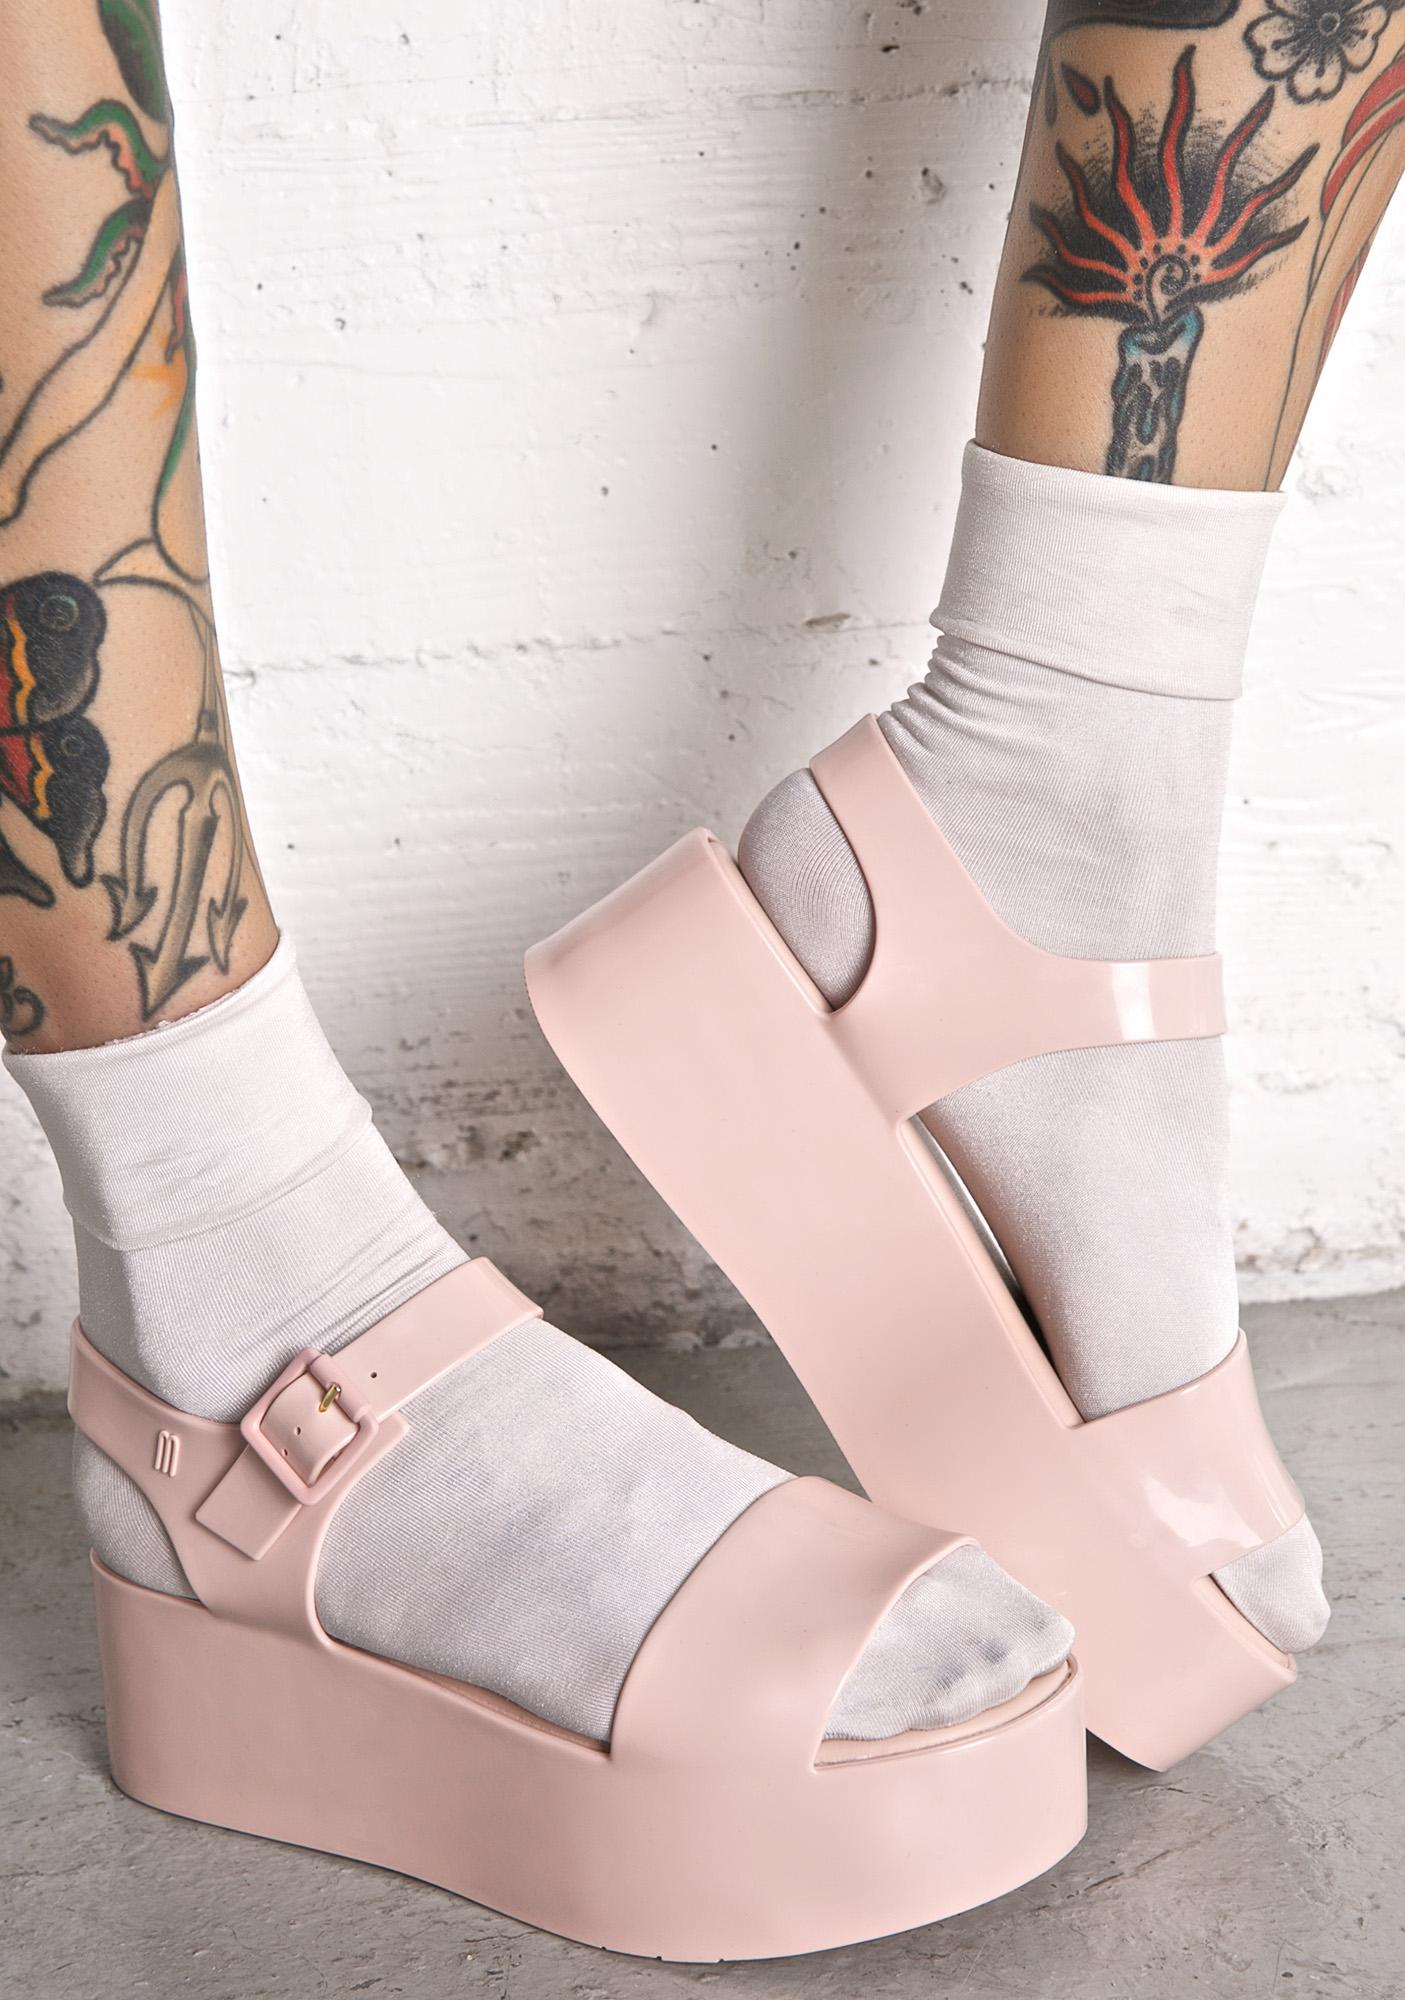 378107dab9c4 Melissa Sweetie Mar Sandals